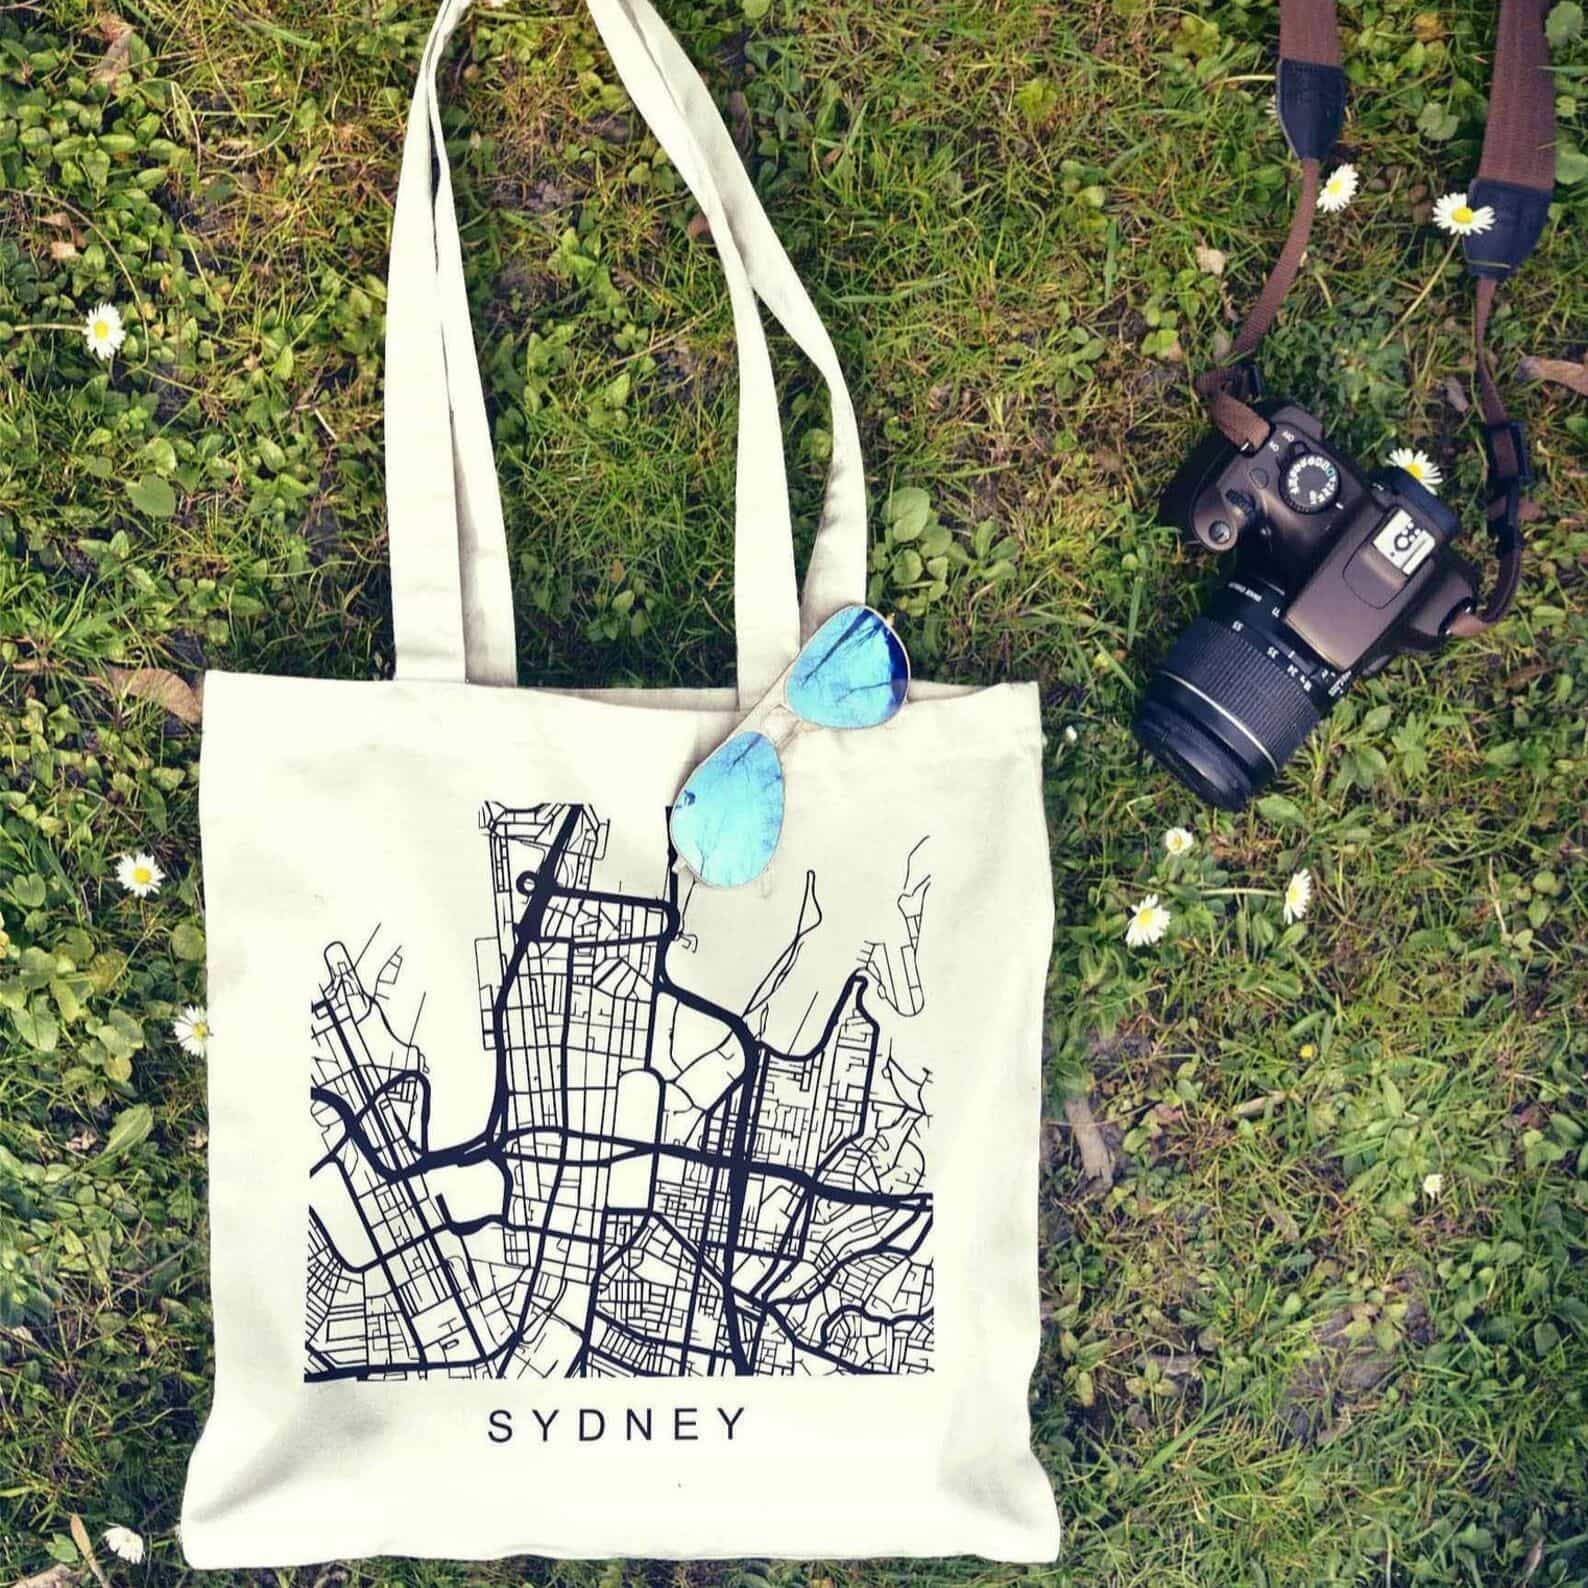 Sydney-canvas-bag